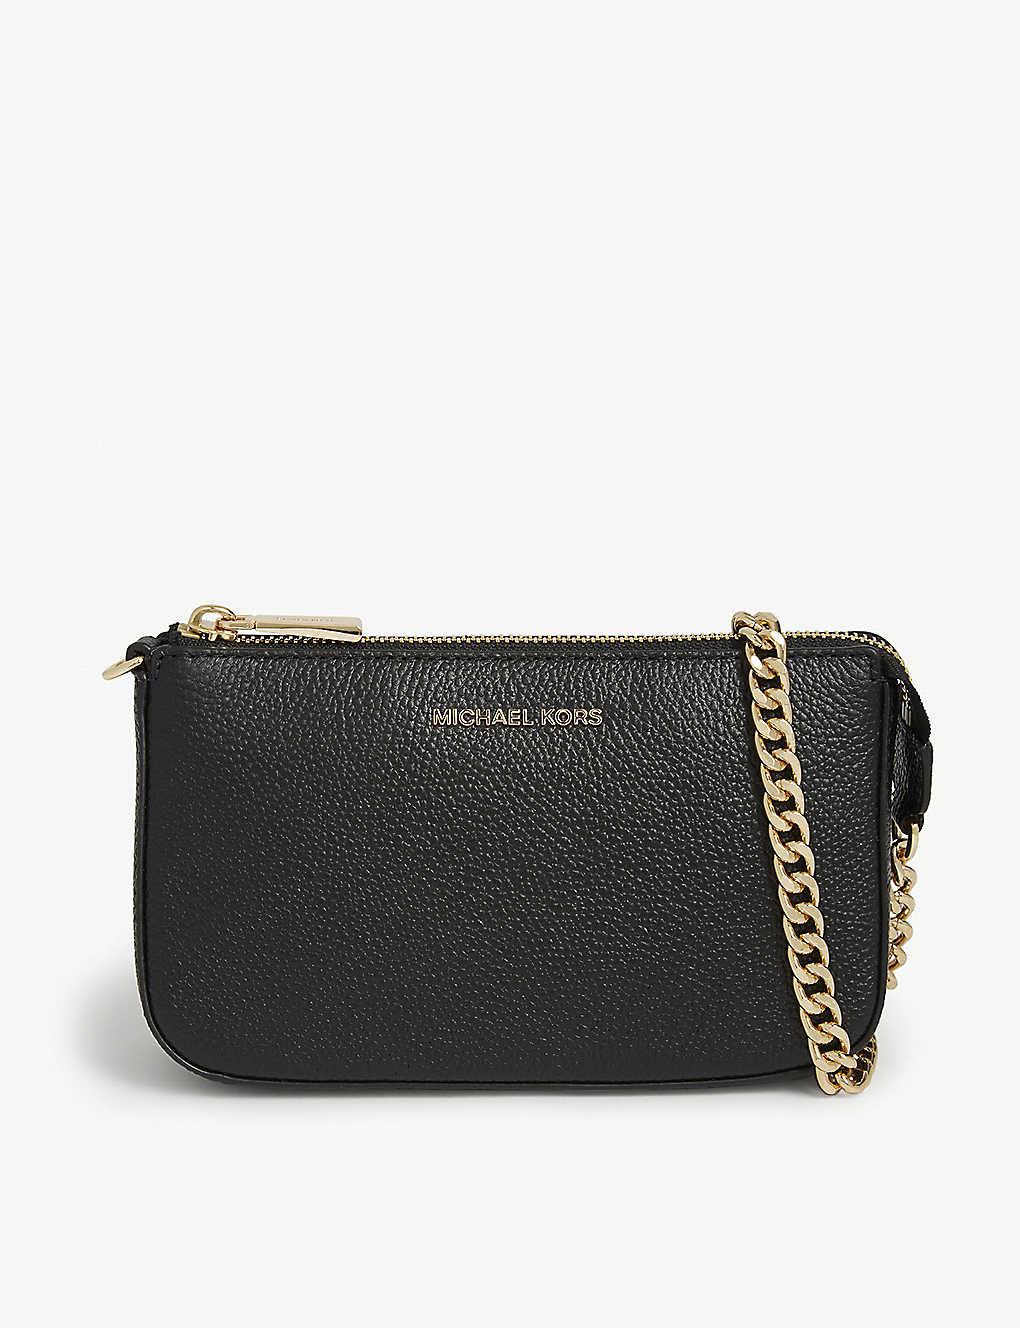 da9f8eac6090 MICHAEL MICHAEL KORS - Textured leather chain wallet | Selfridges.com